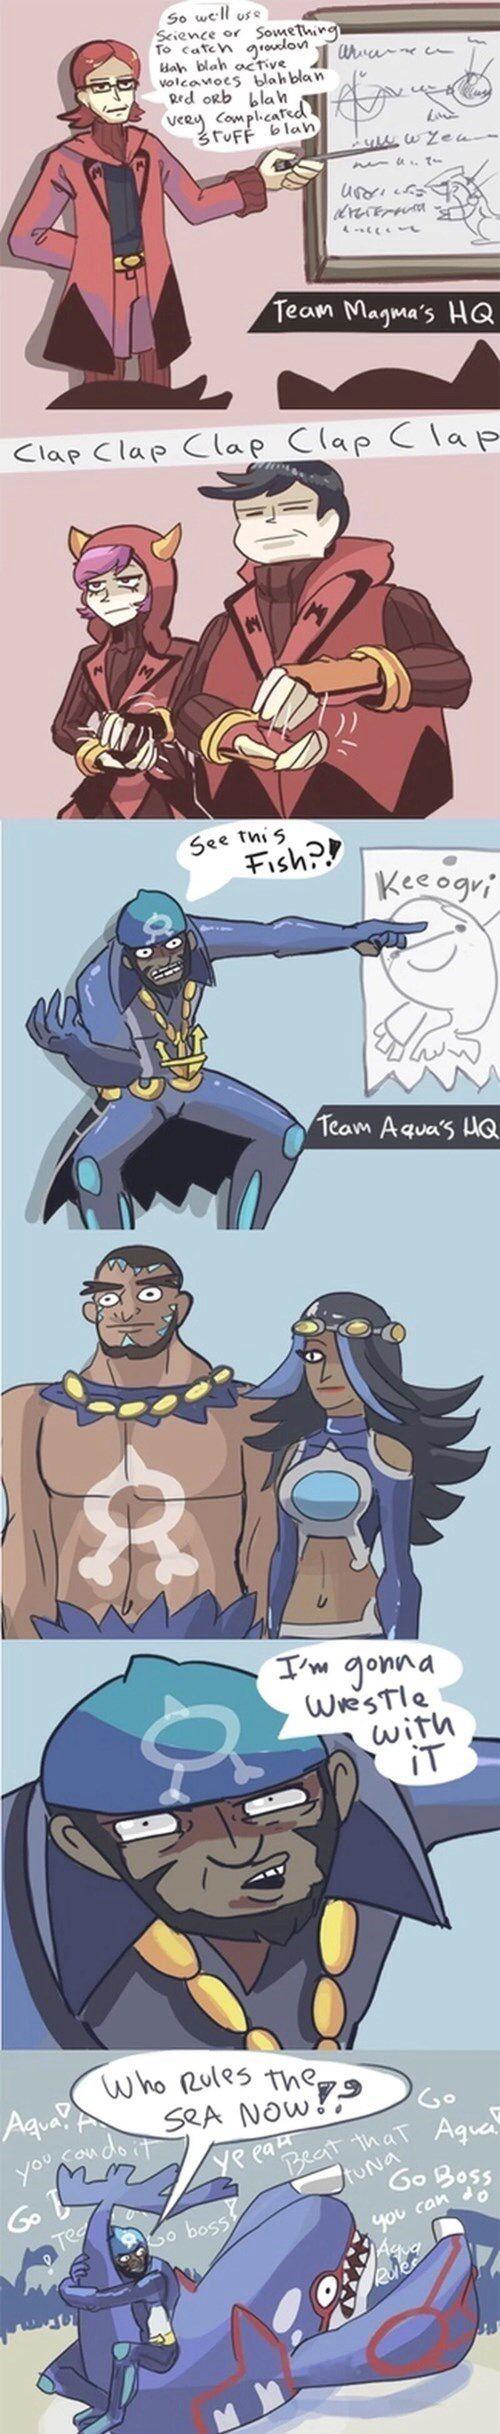 Team Magma vs. Team Aqua